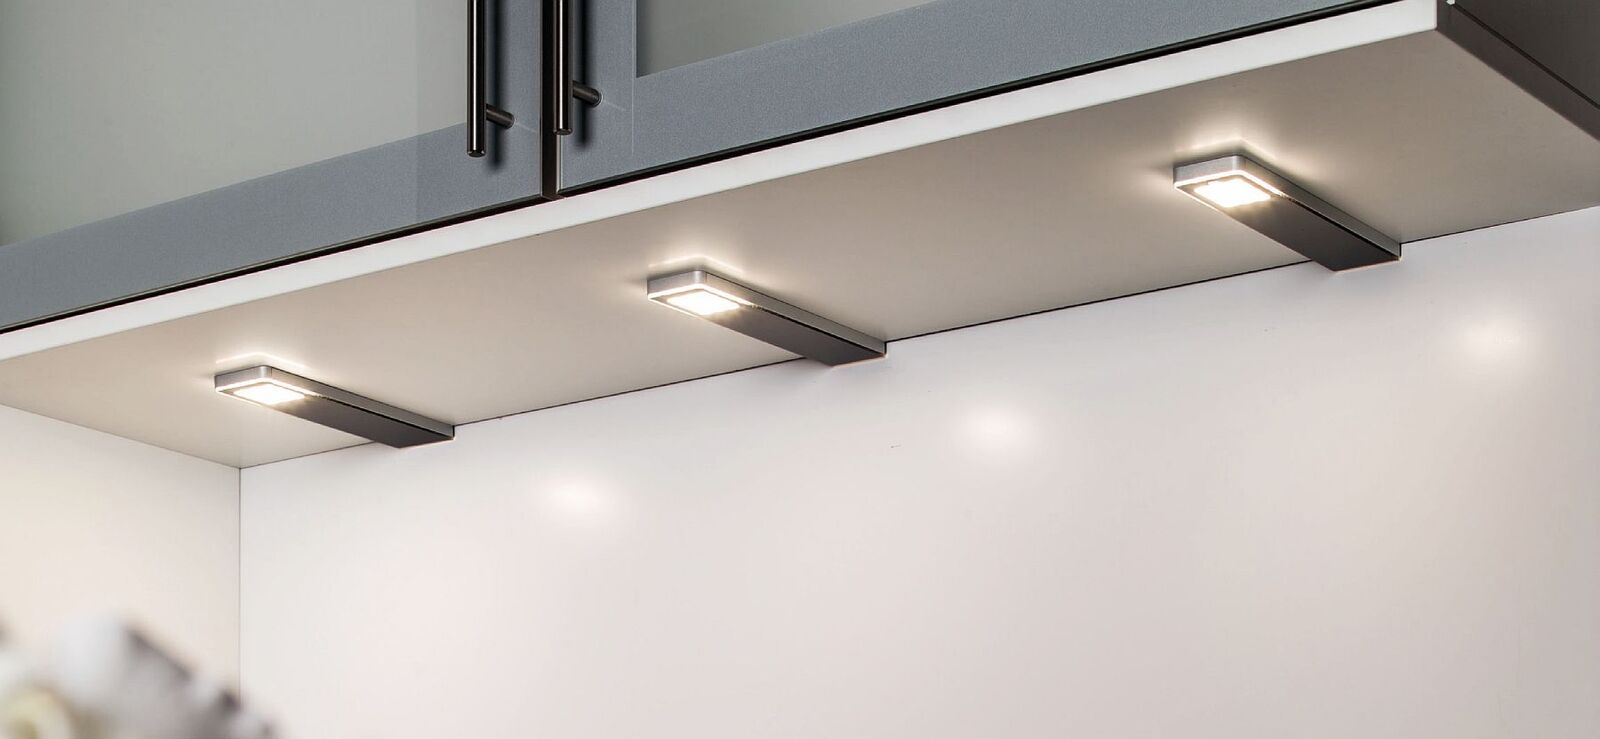 4-er Set LED Unterbauleuchte Lampen dimmbar Küche 4x5 W Konverter ...